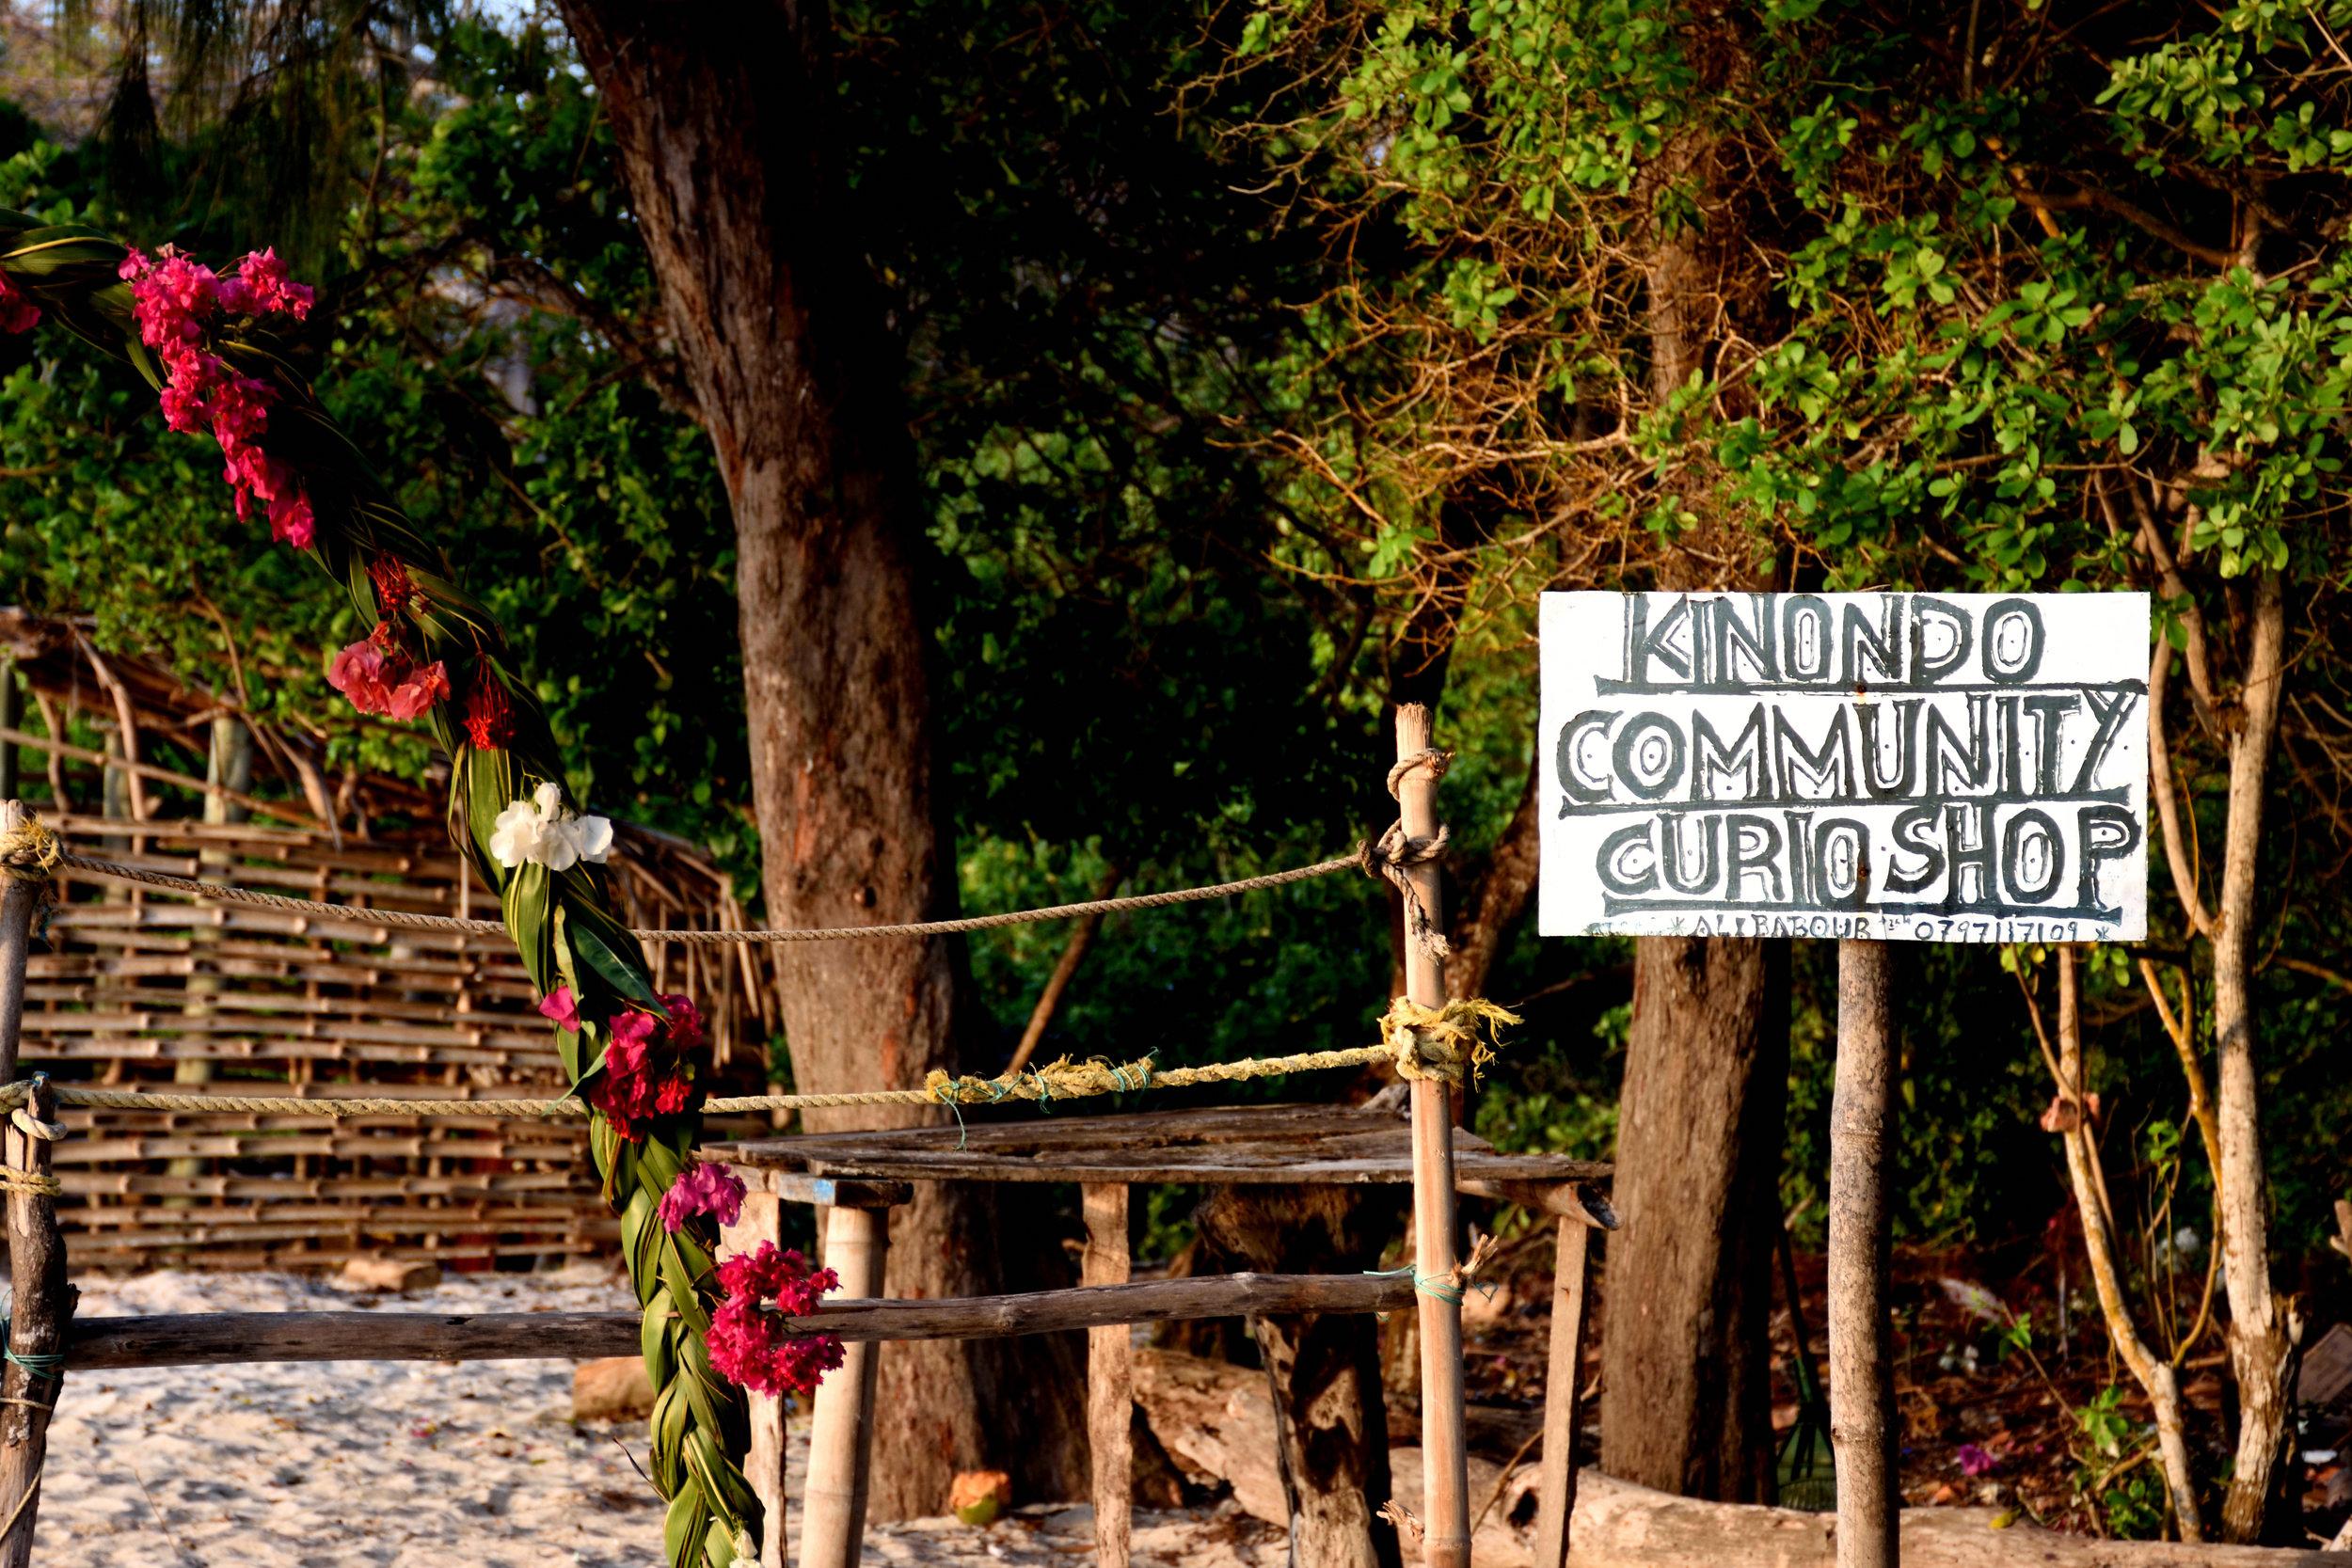 Kindondo Kwetu, Kenya, October 2017